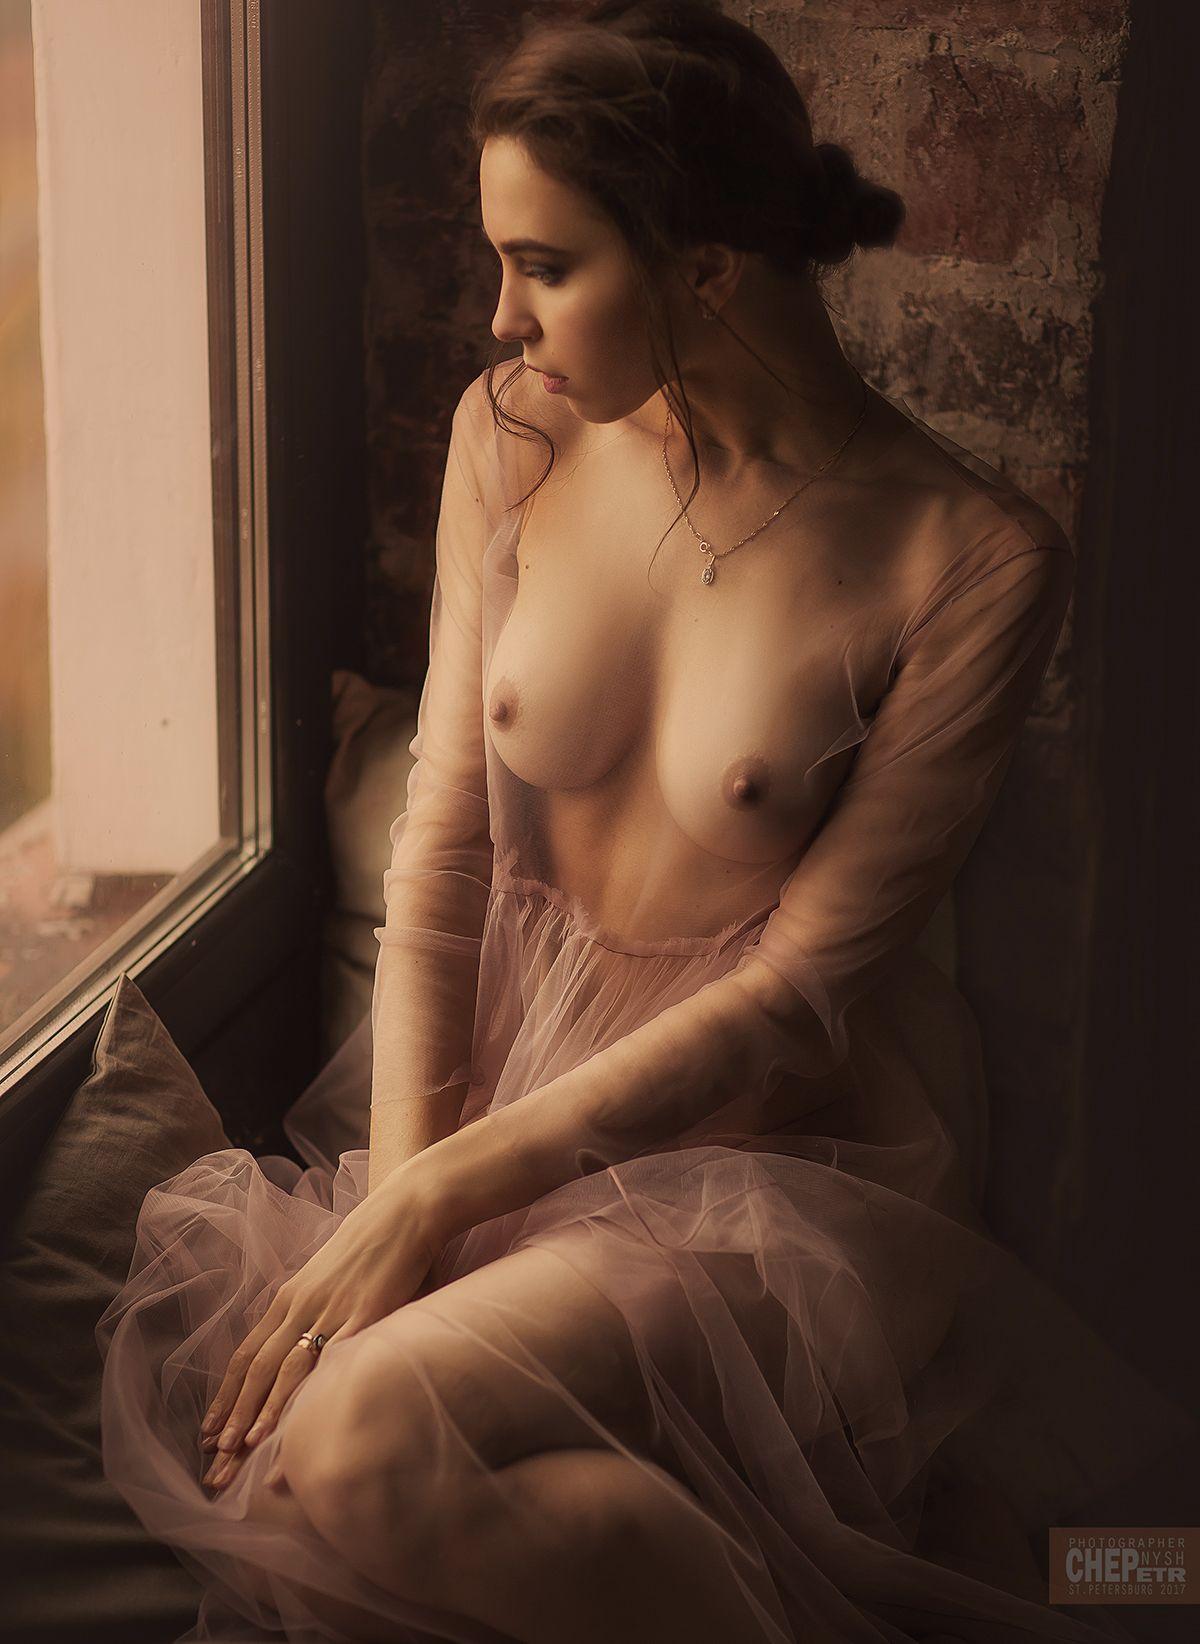 Lana chepetr chepeterphoto nu nu-art